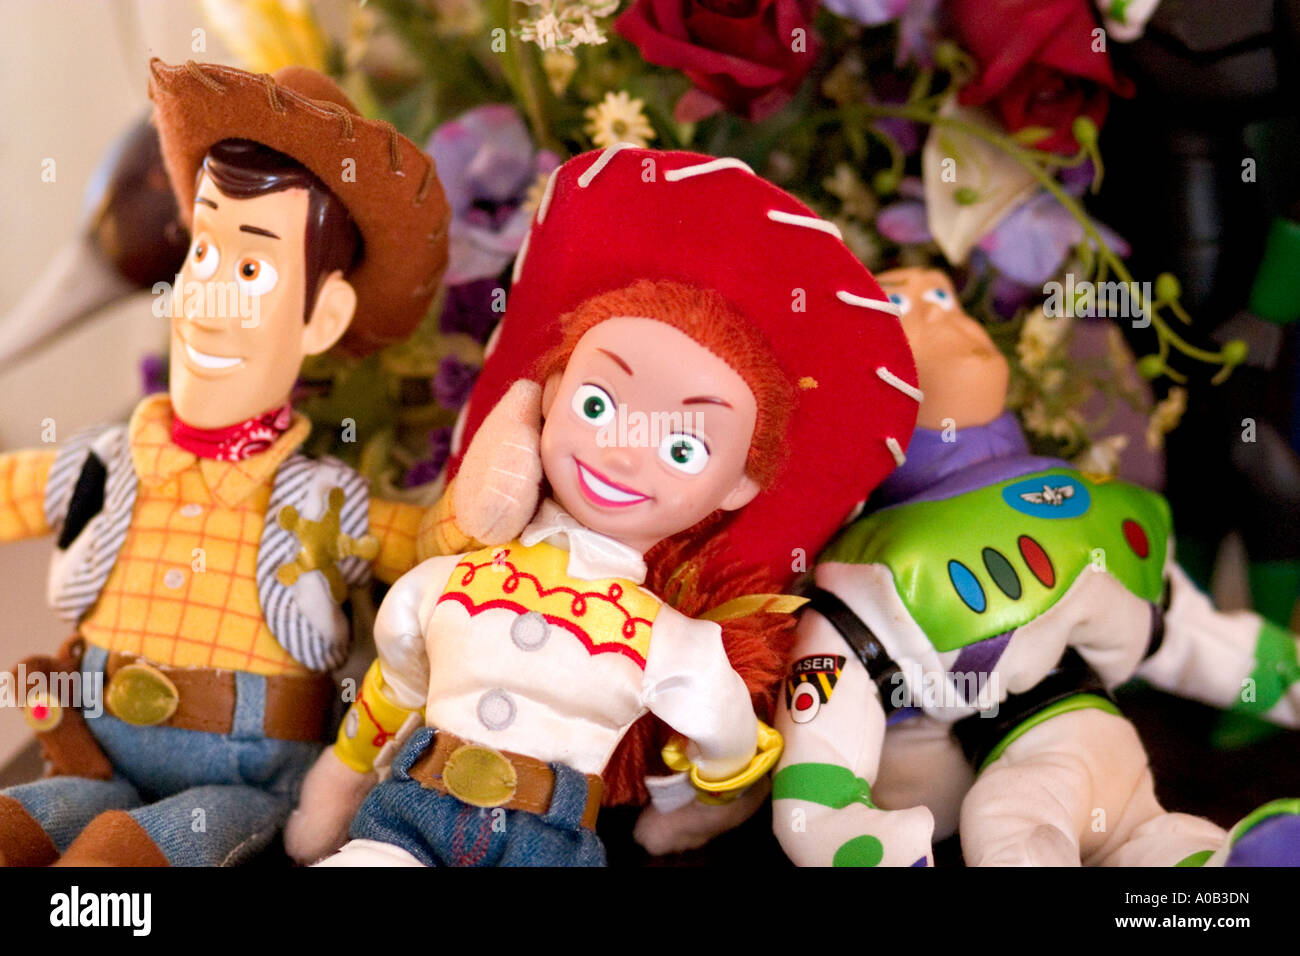 Toy Story dolls Woody Jessie and Buzz Lightyear ready to play. St Paul Minnesota MN USA - Stock Image